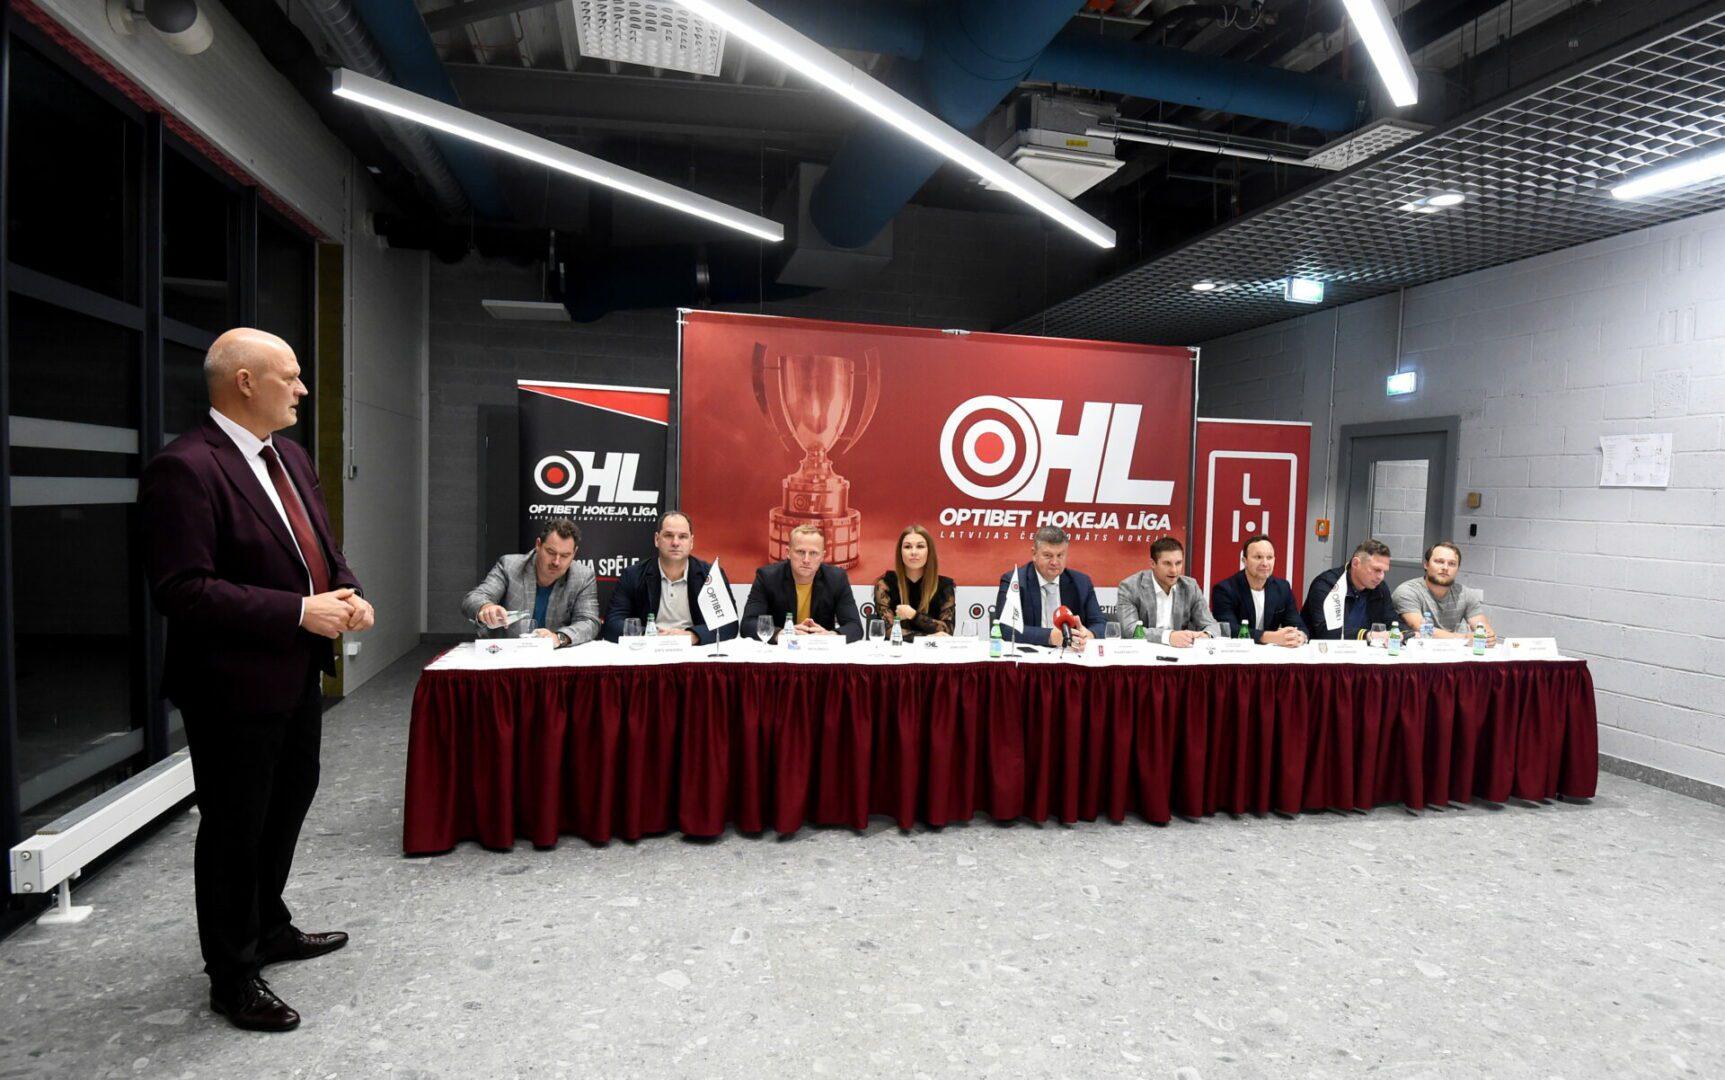 """Optibet"" hokeja līgas preses konference"